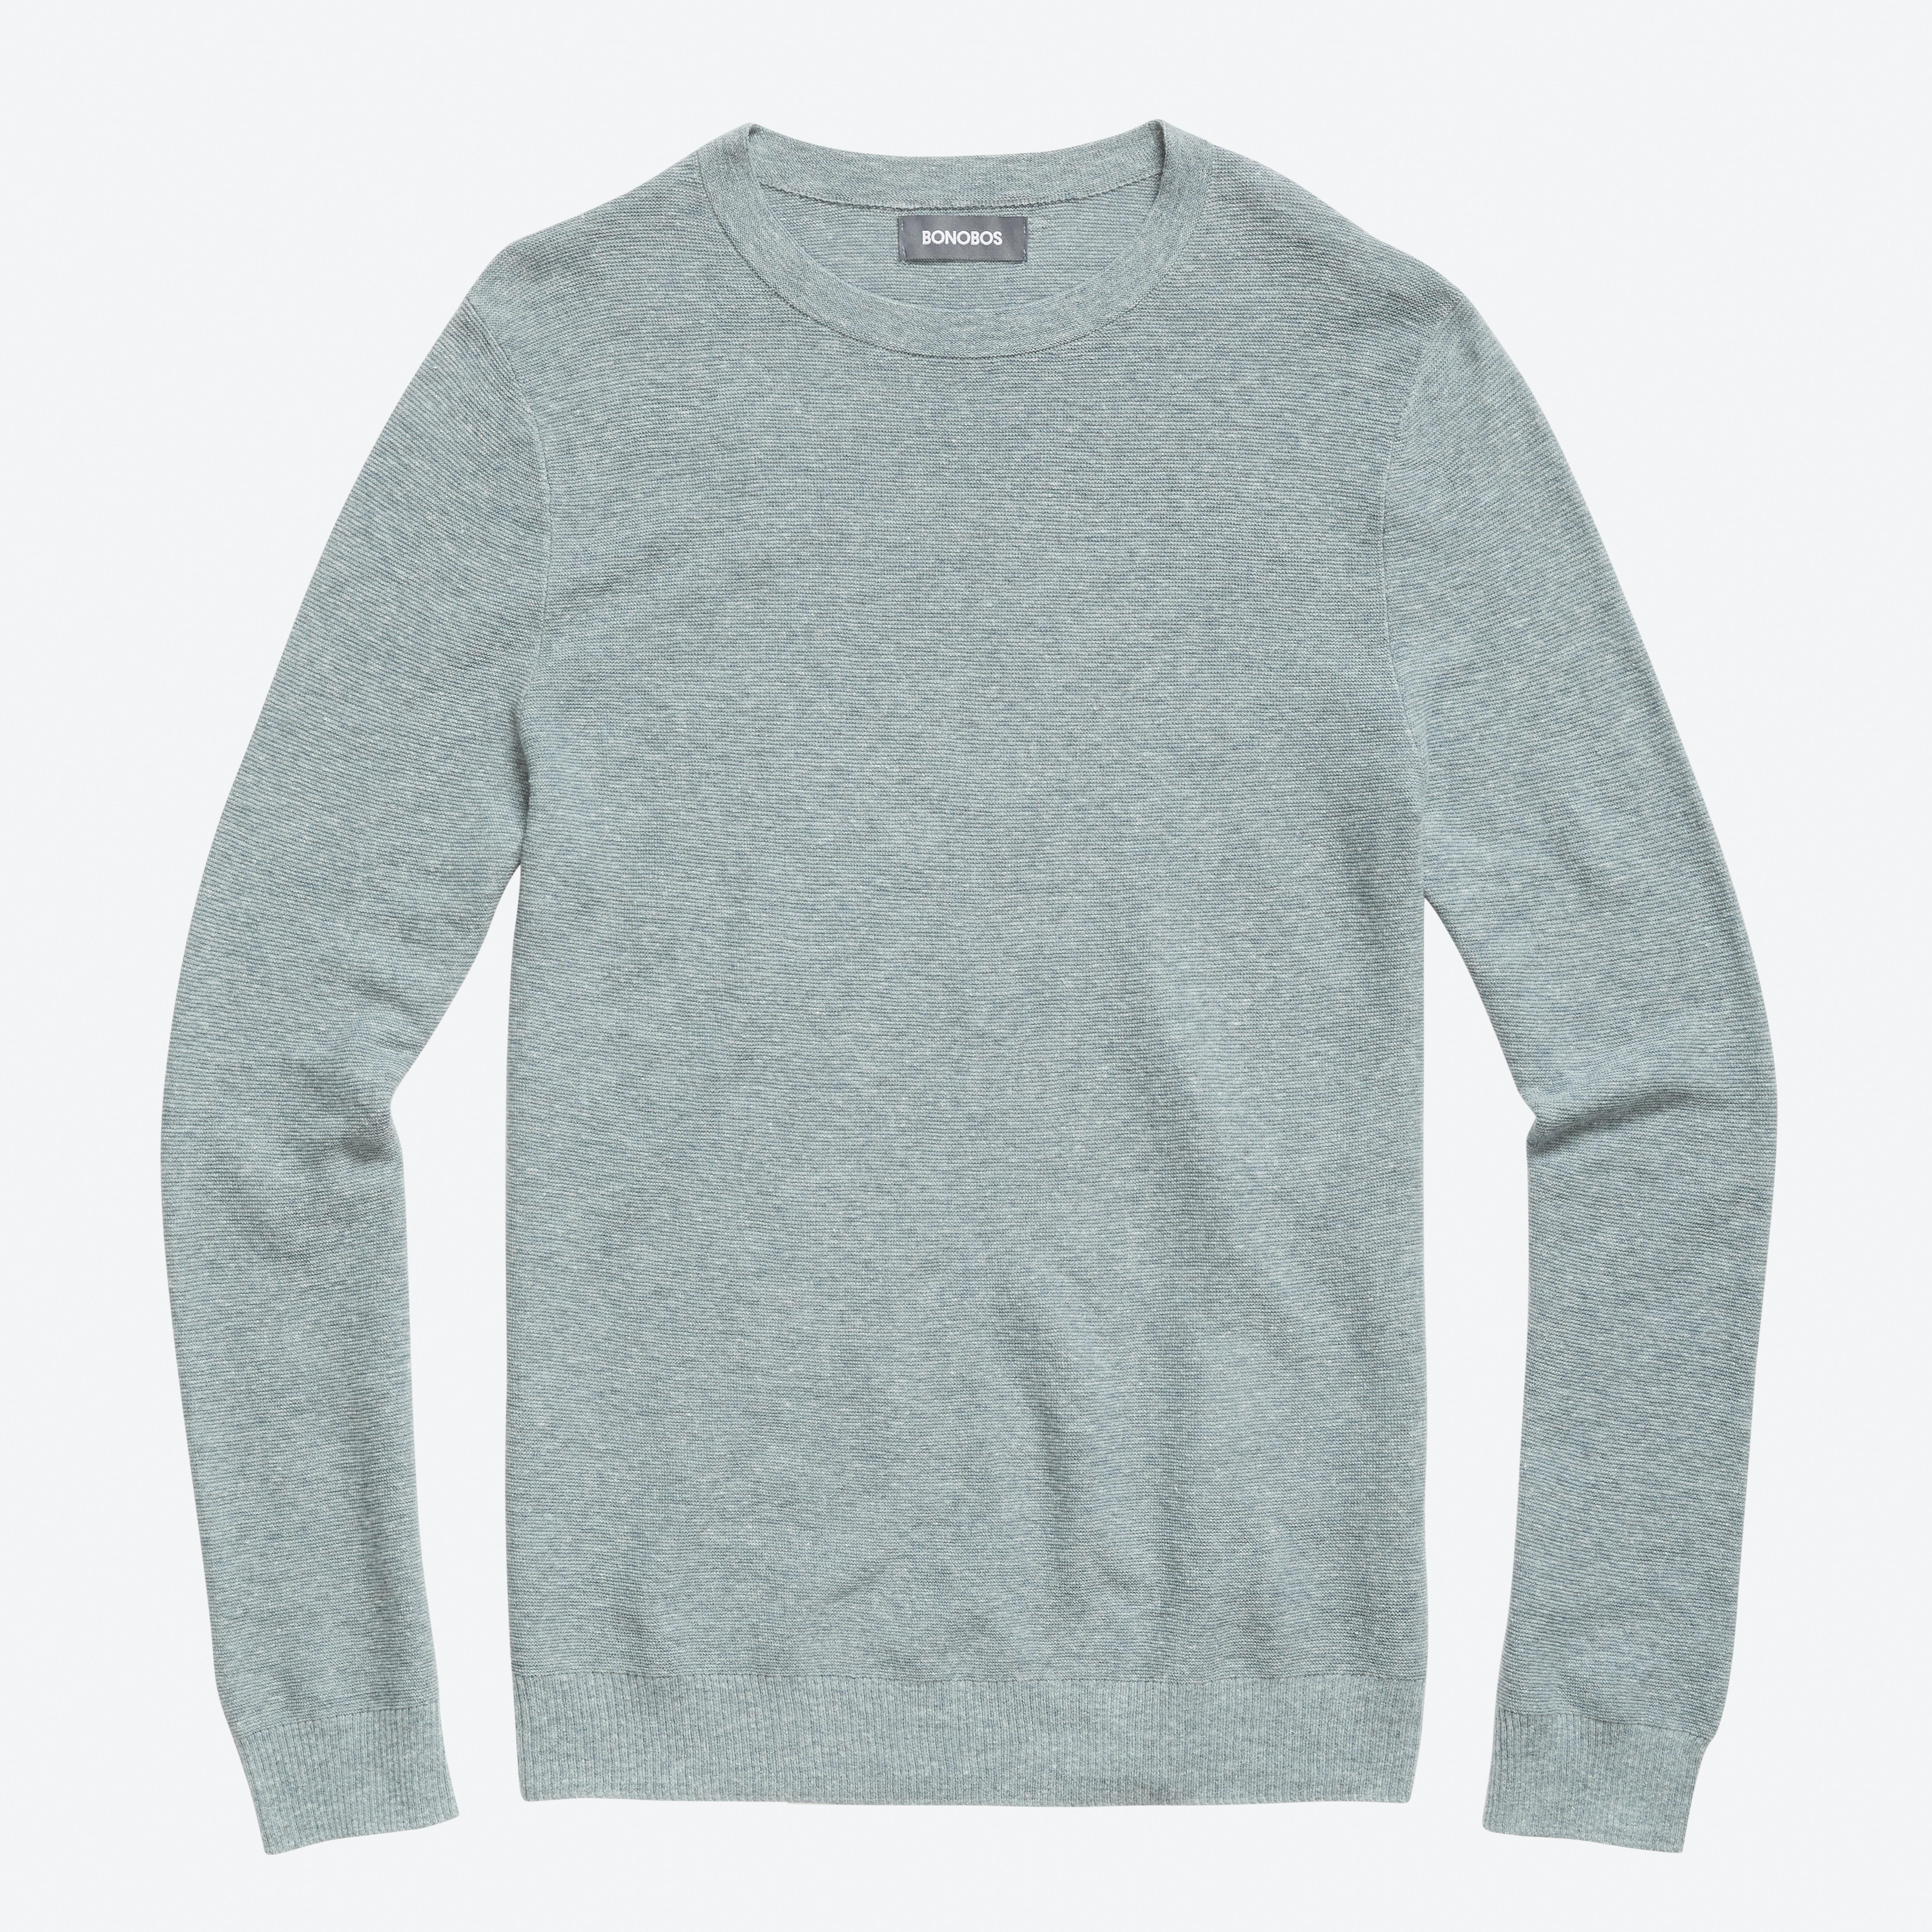 Cotton Linen Crew Neck Sweater